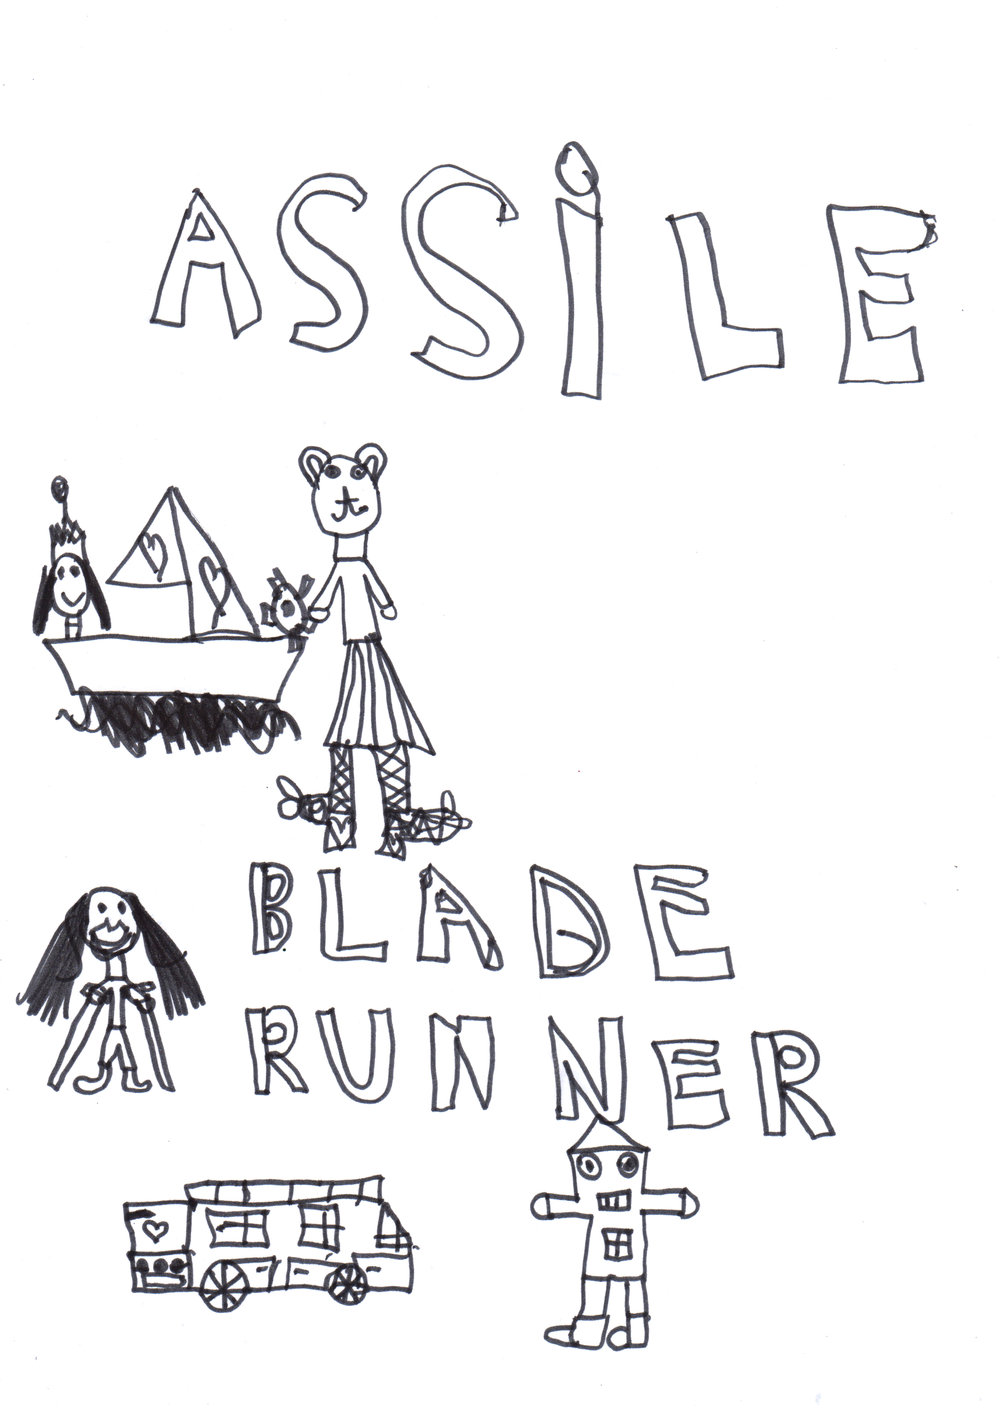 ASSILE_BLADERUNNER.jpg